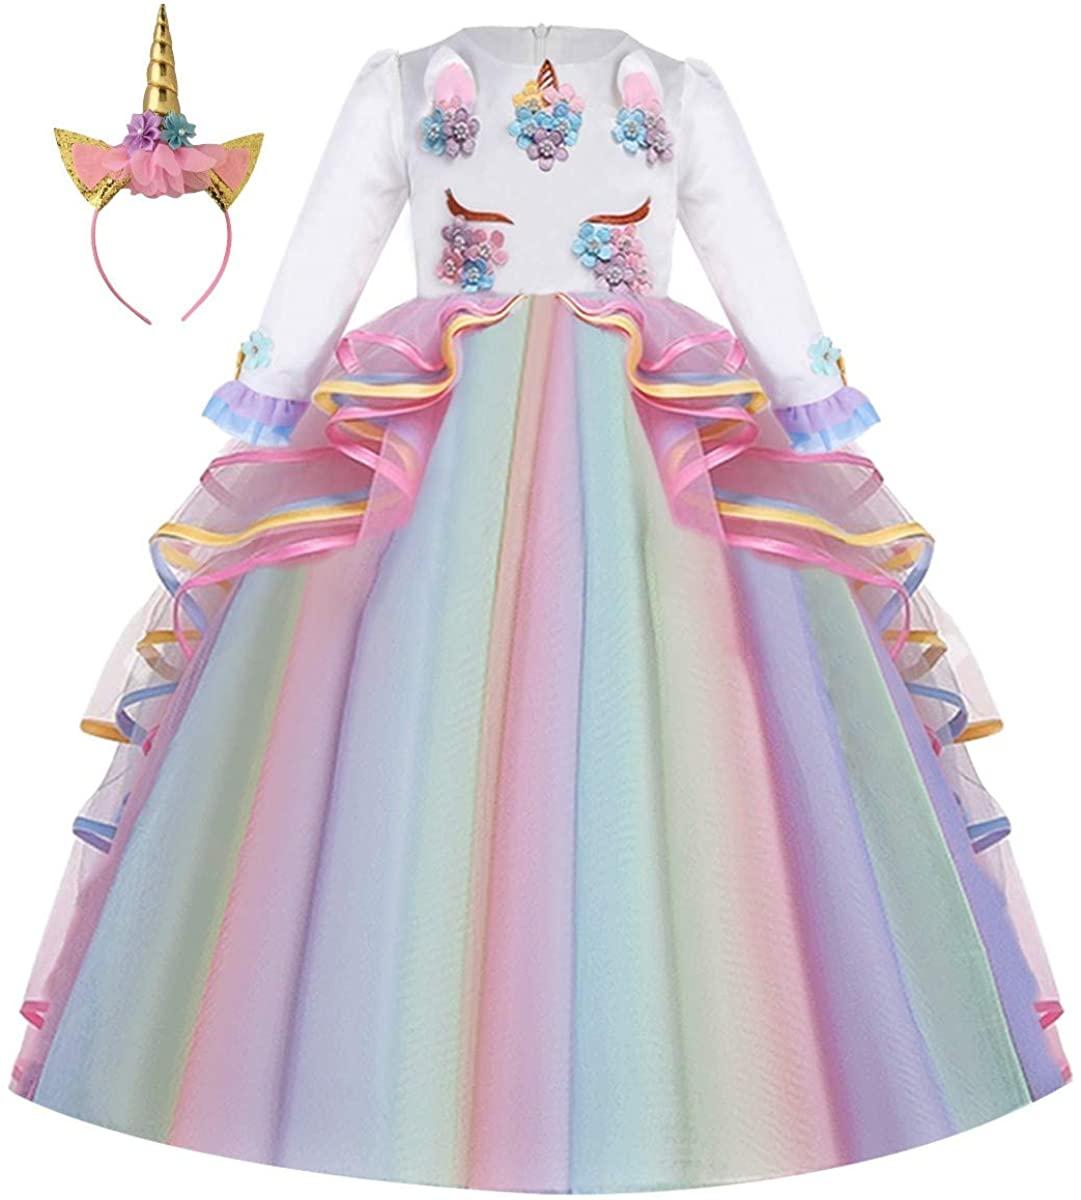 HIHCBF Girls Unicorn Birthday Princess Long Sleeve Wedding Pageant Party Maxi Dress Halloween Carnival Costume w/Headband